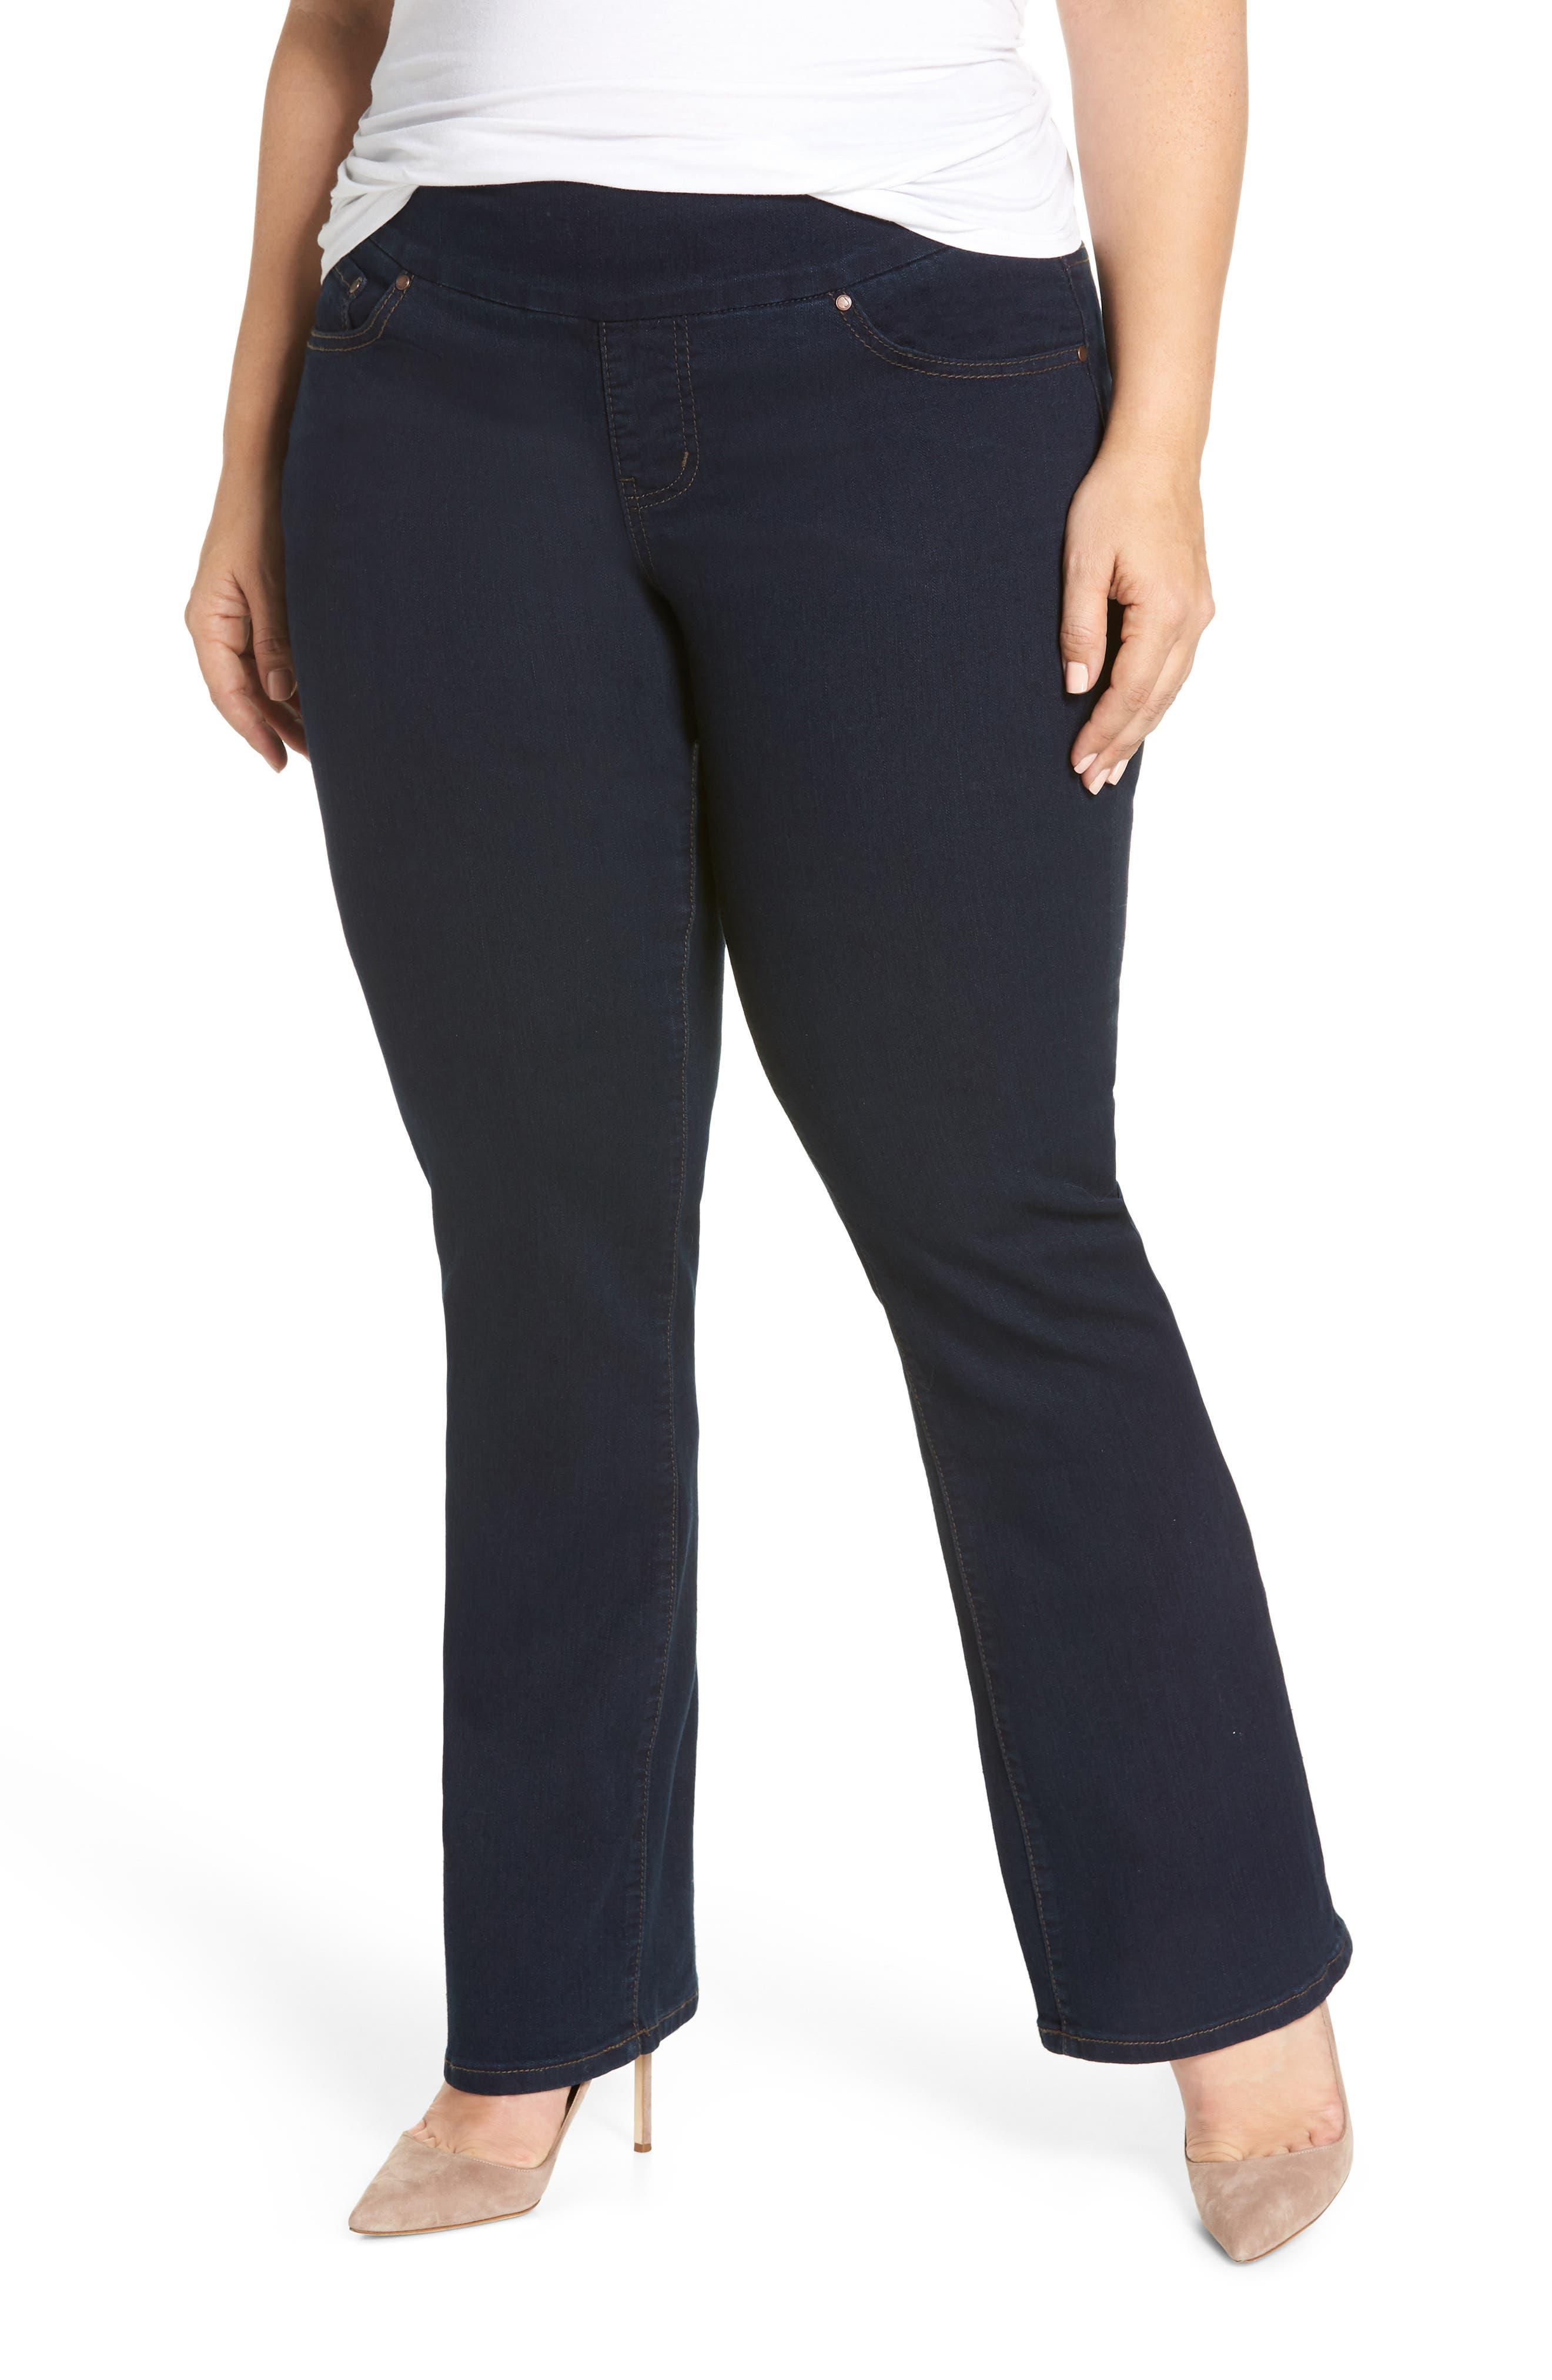 Plus Women's Jag Jeans Peri Stretch Straight Leg Jeans